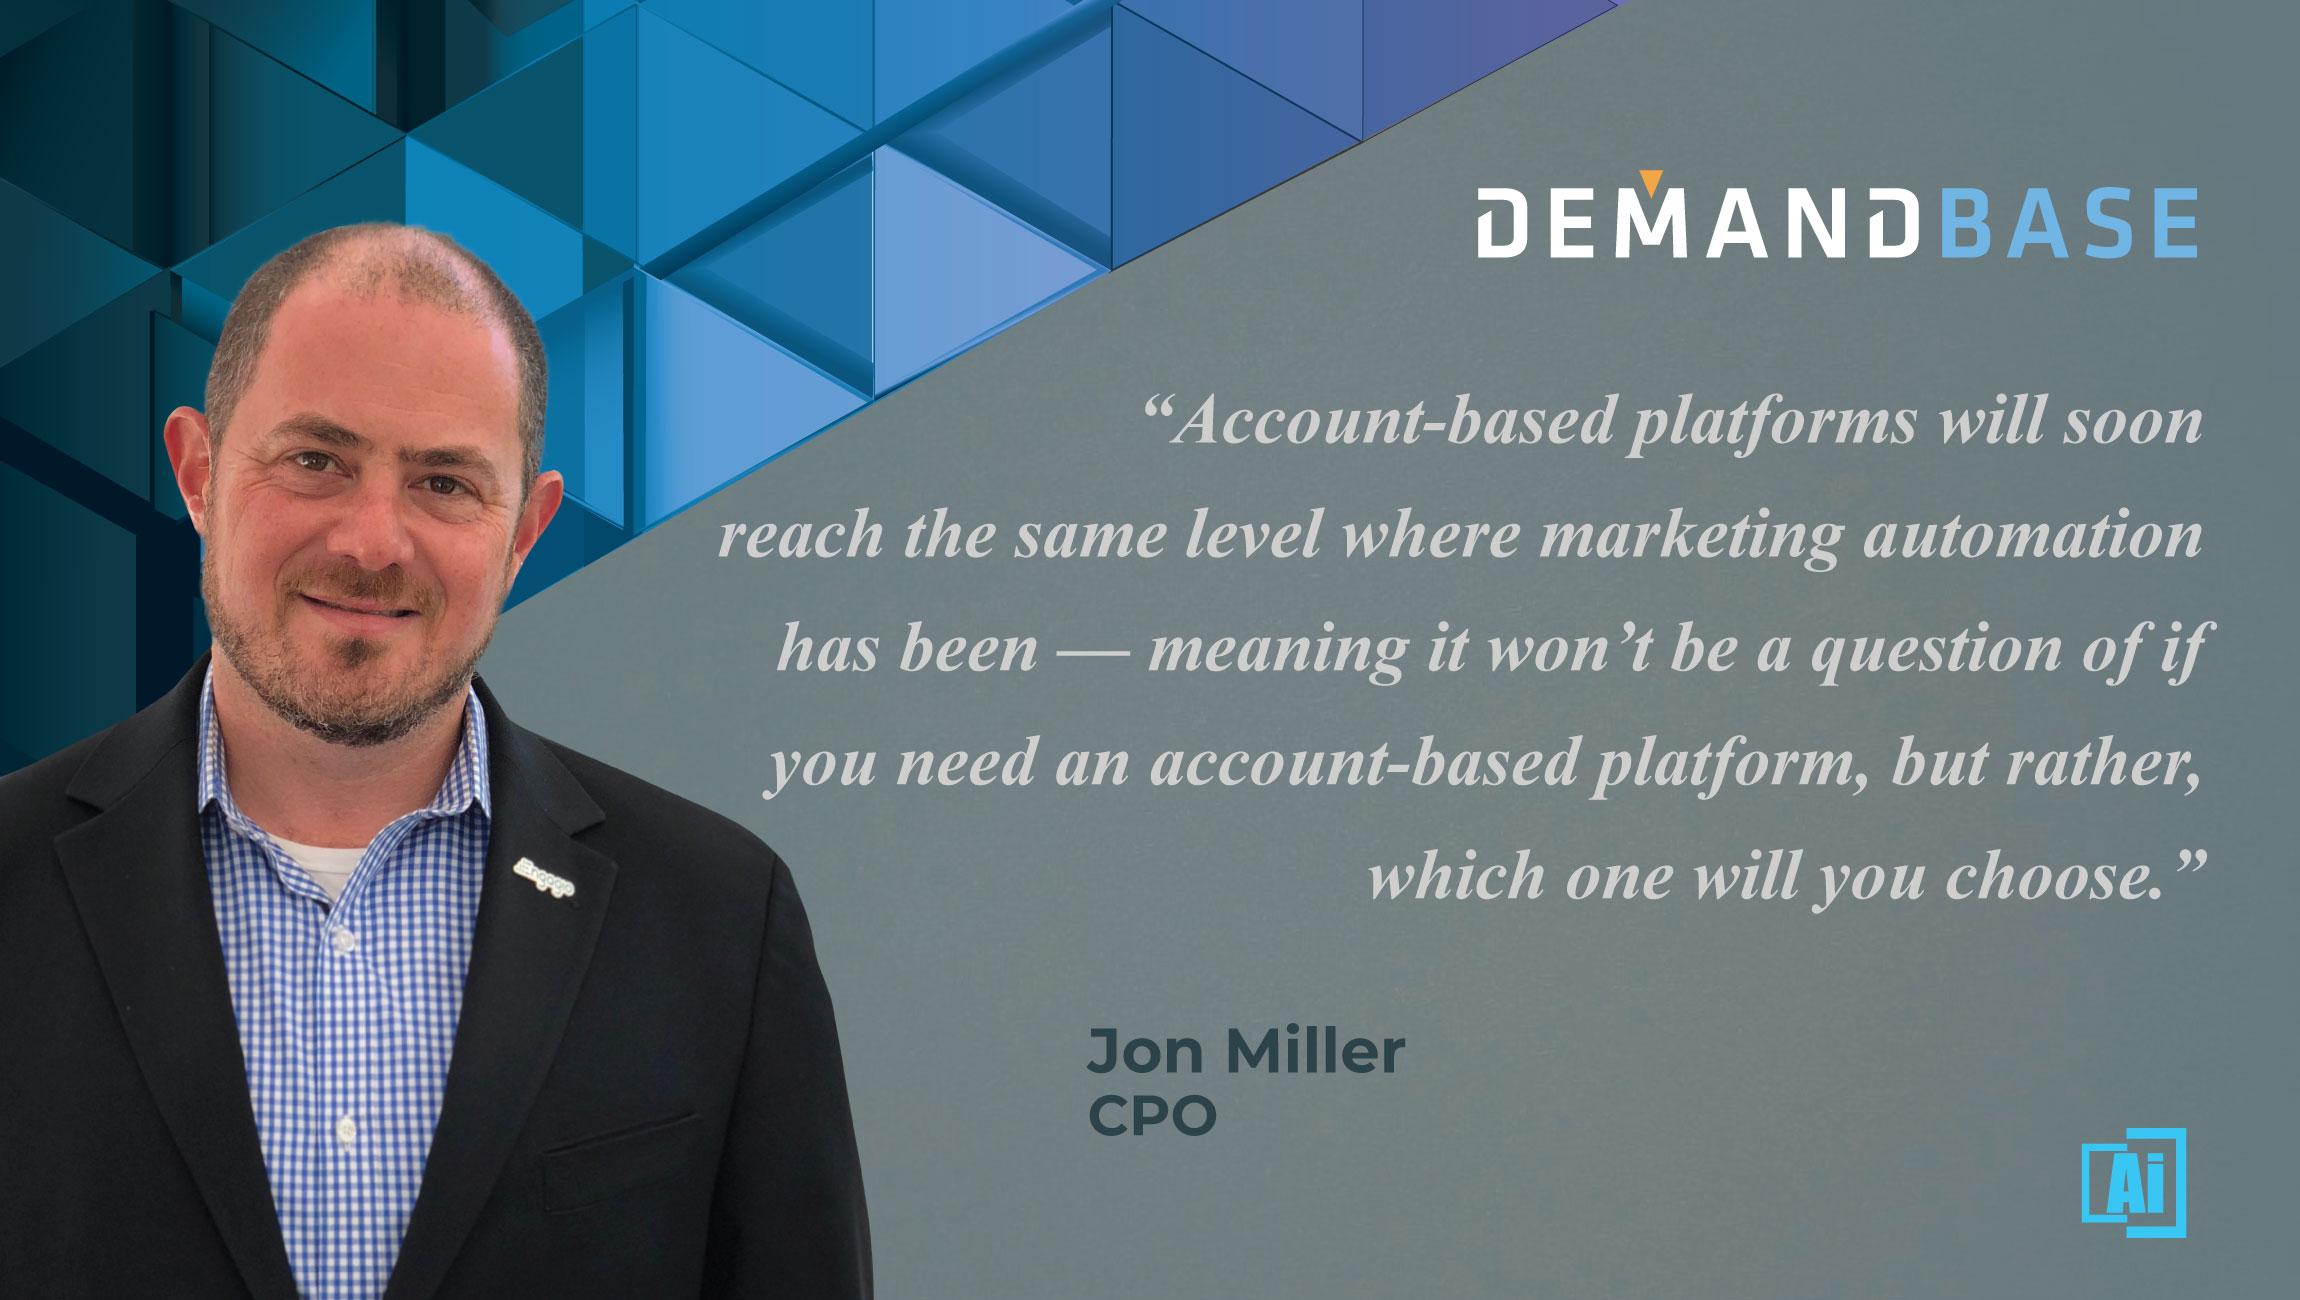 AiThority Interview with Jon Miller, CPO at Demandbase